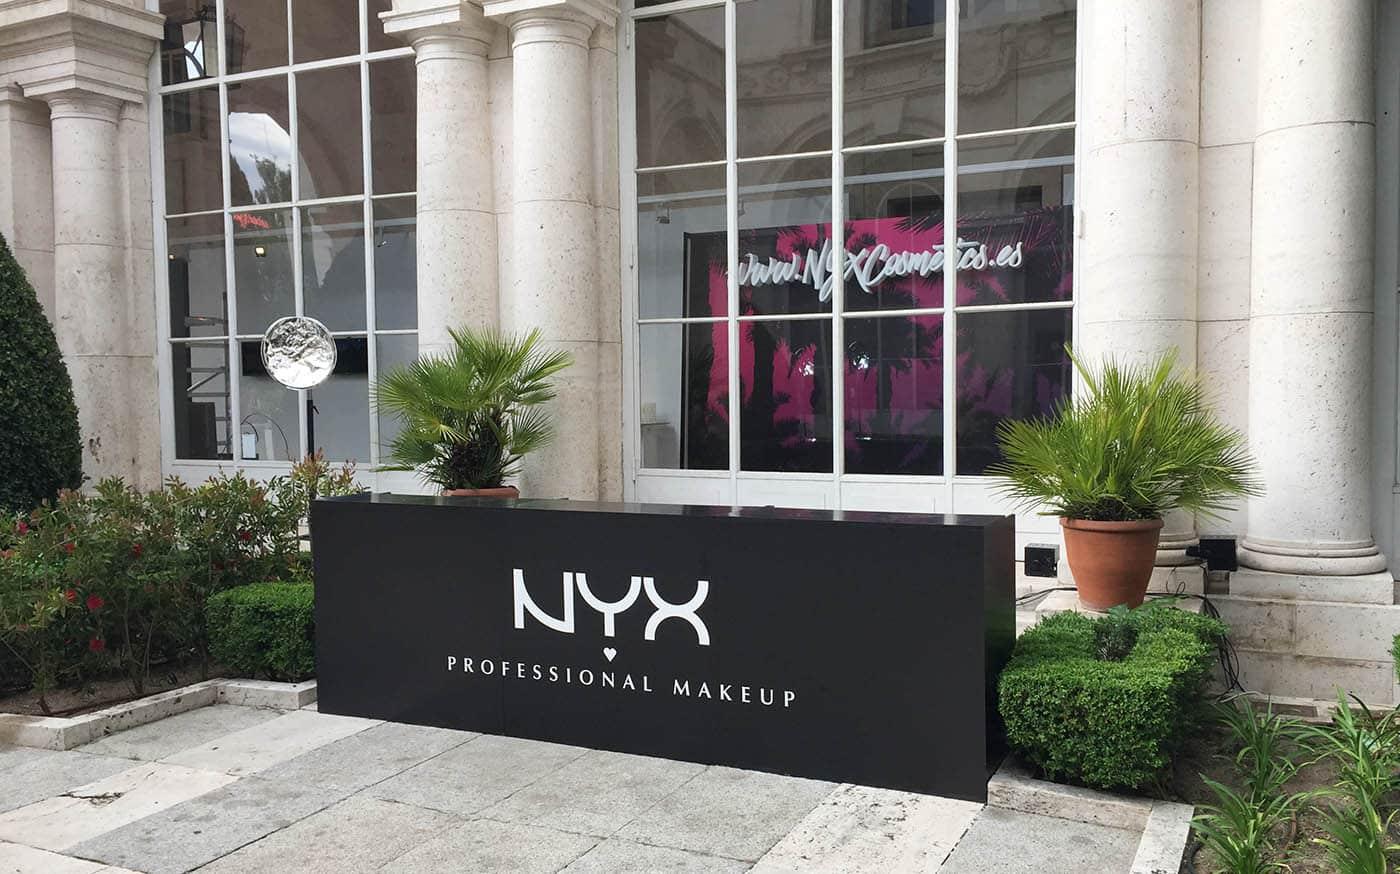 instore-clientes-NYX-muebles-de-madera-con-vinilo-de-corte-para-evento